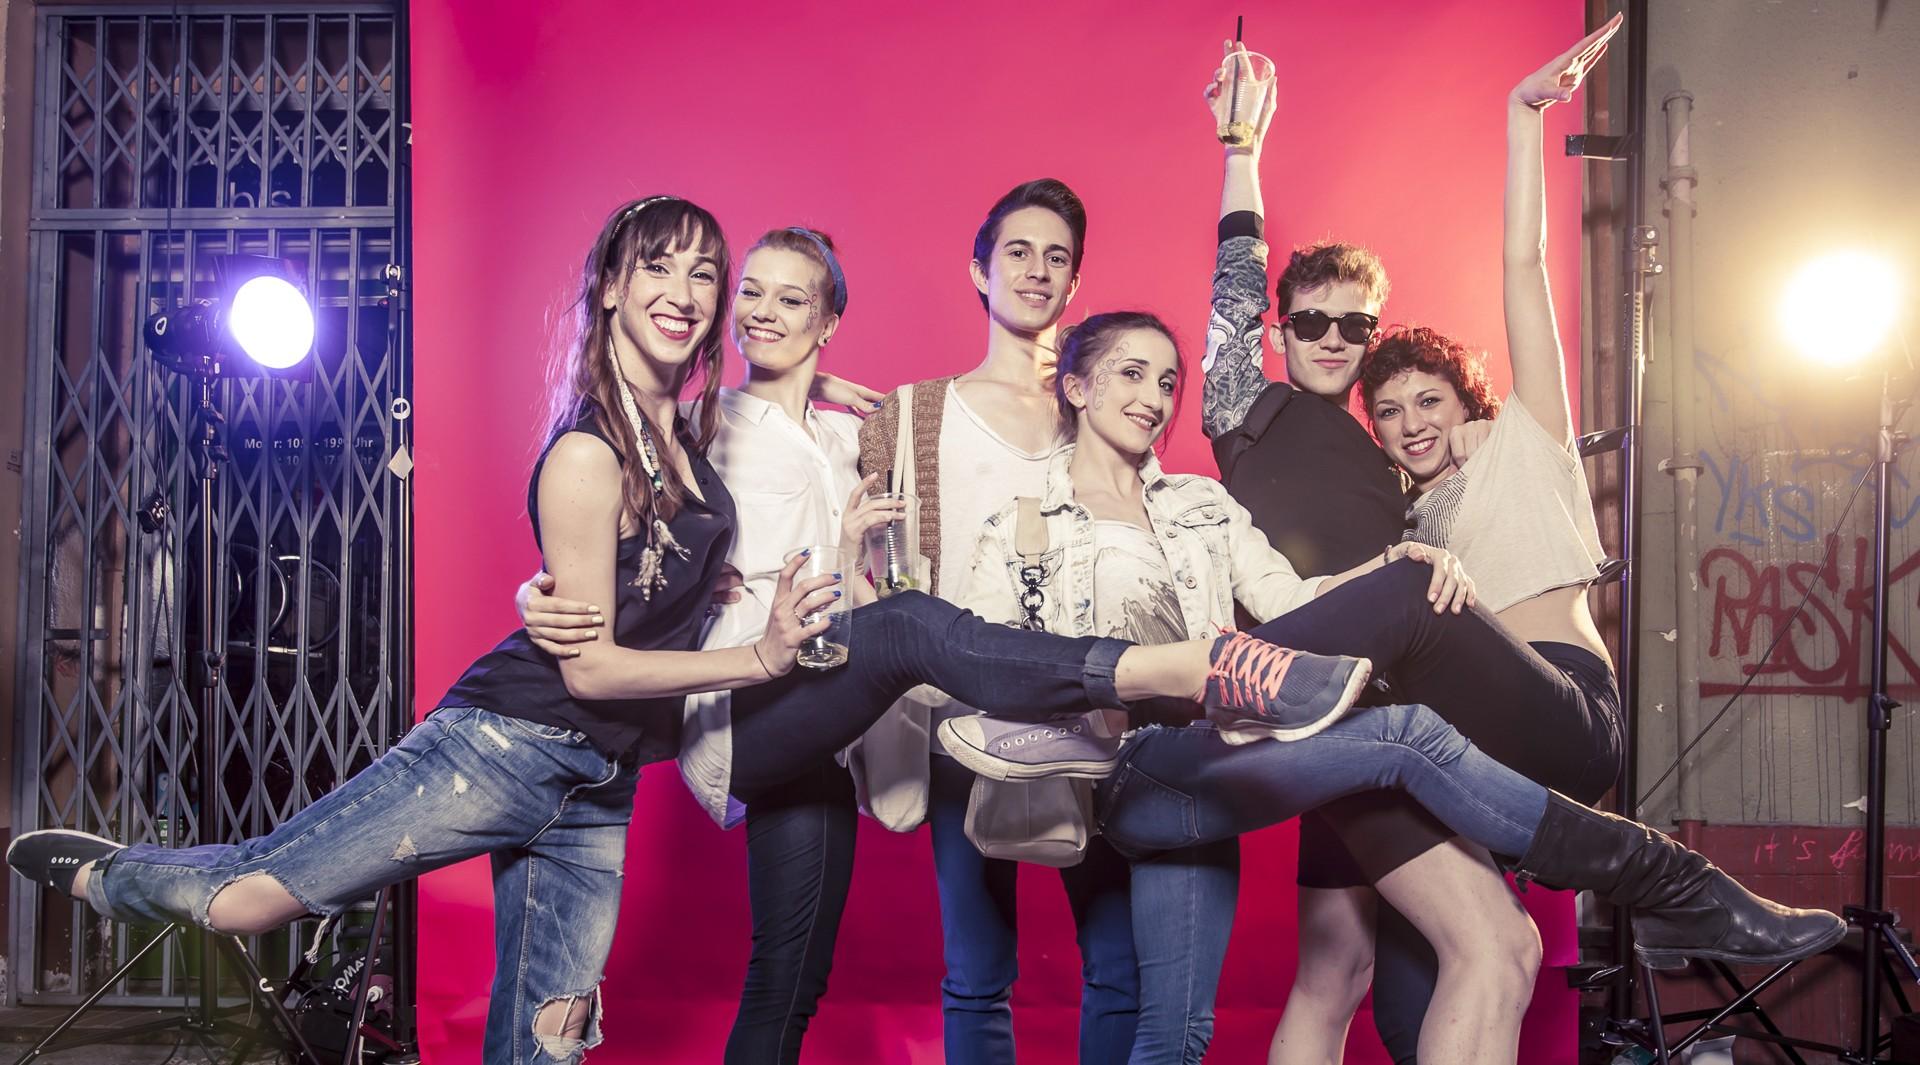 Studio 314 Mayday 2014